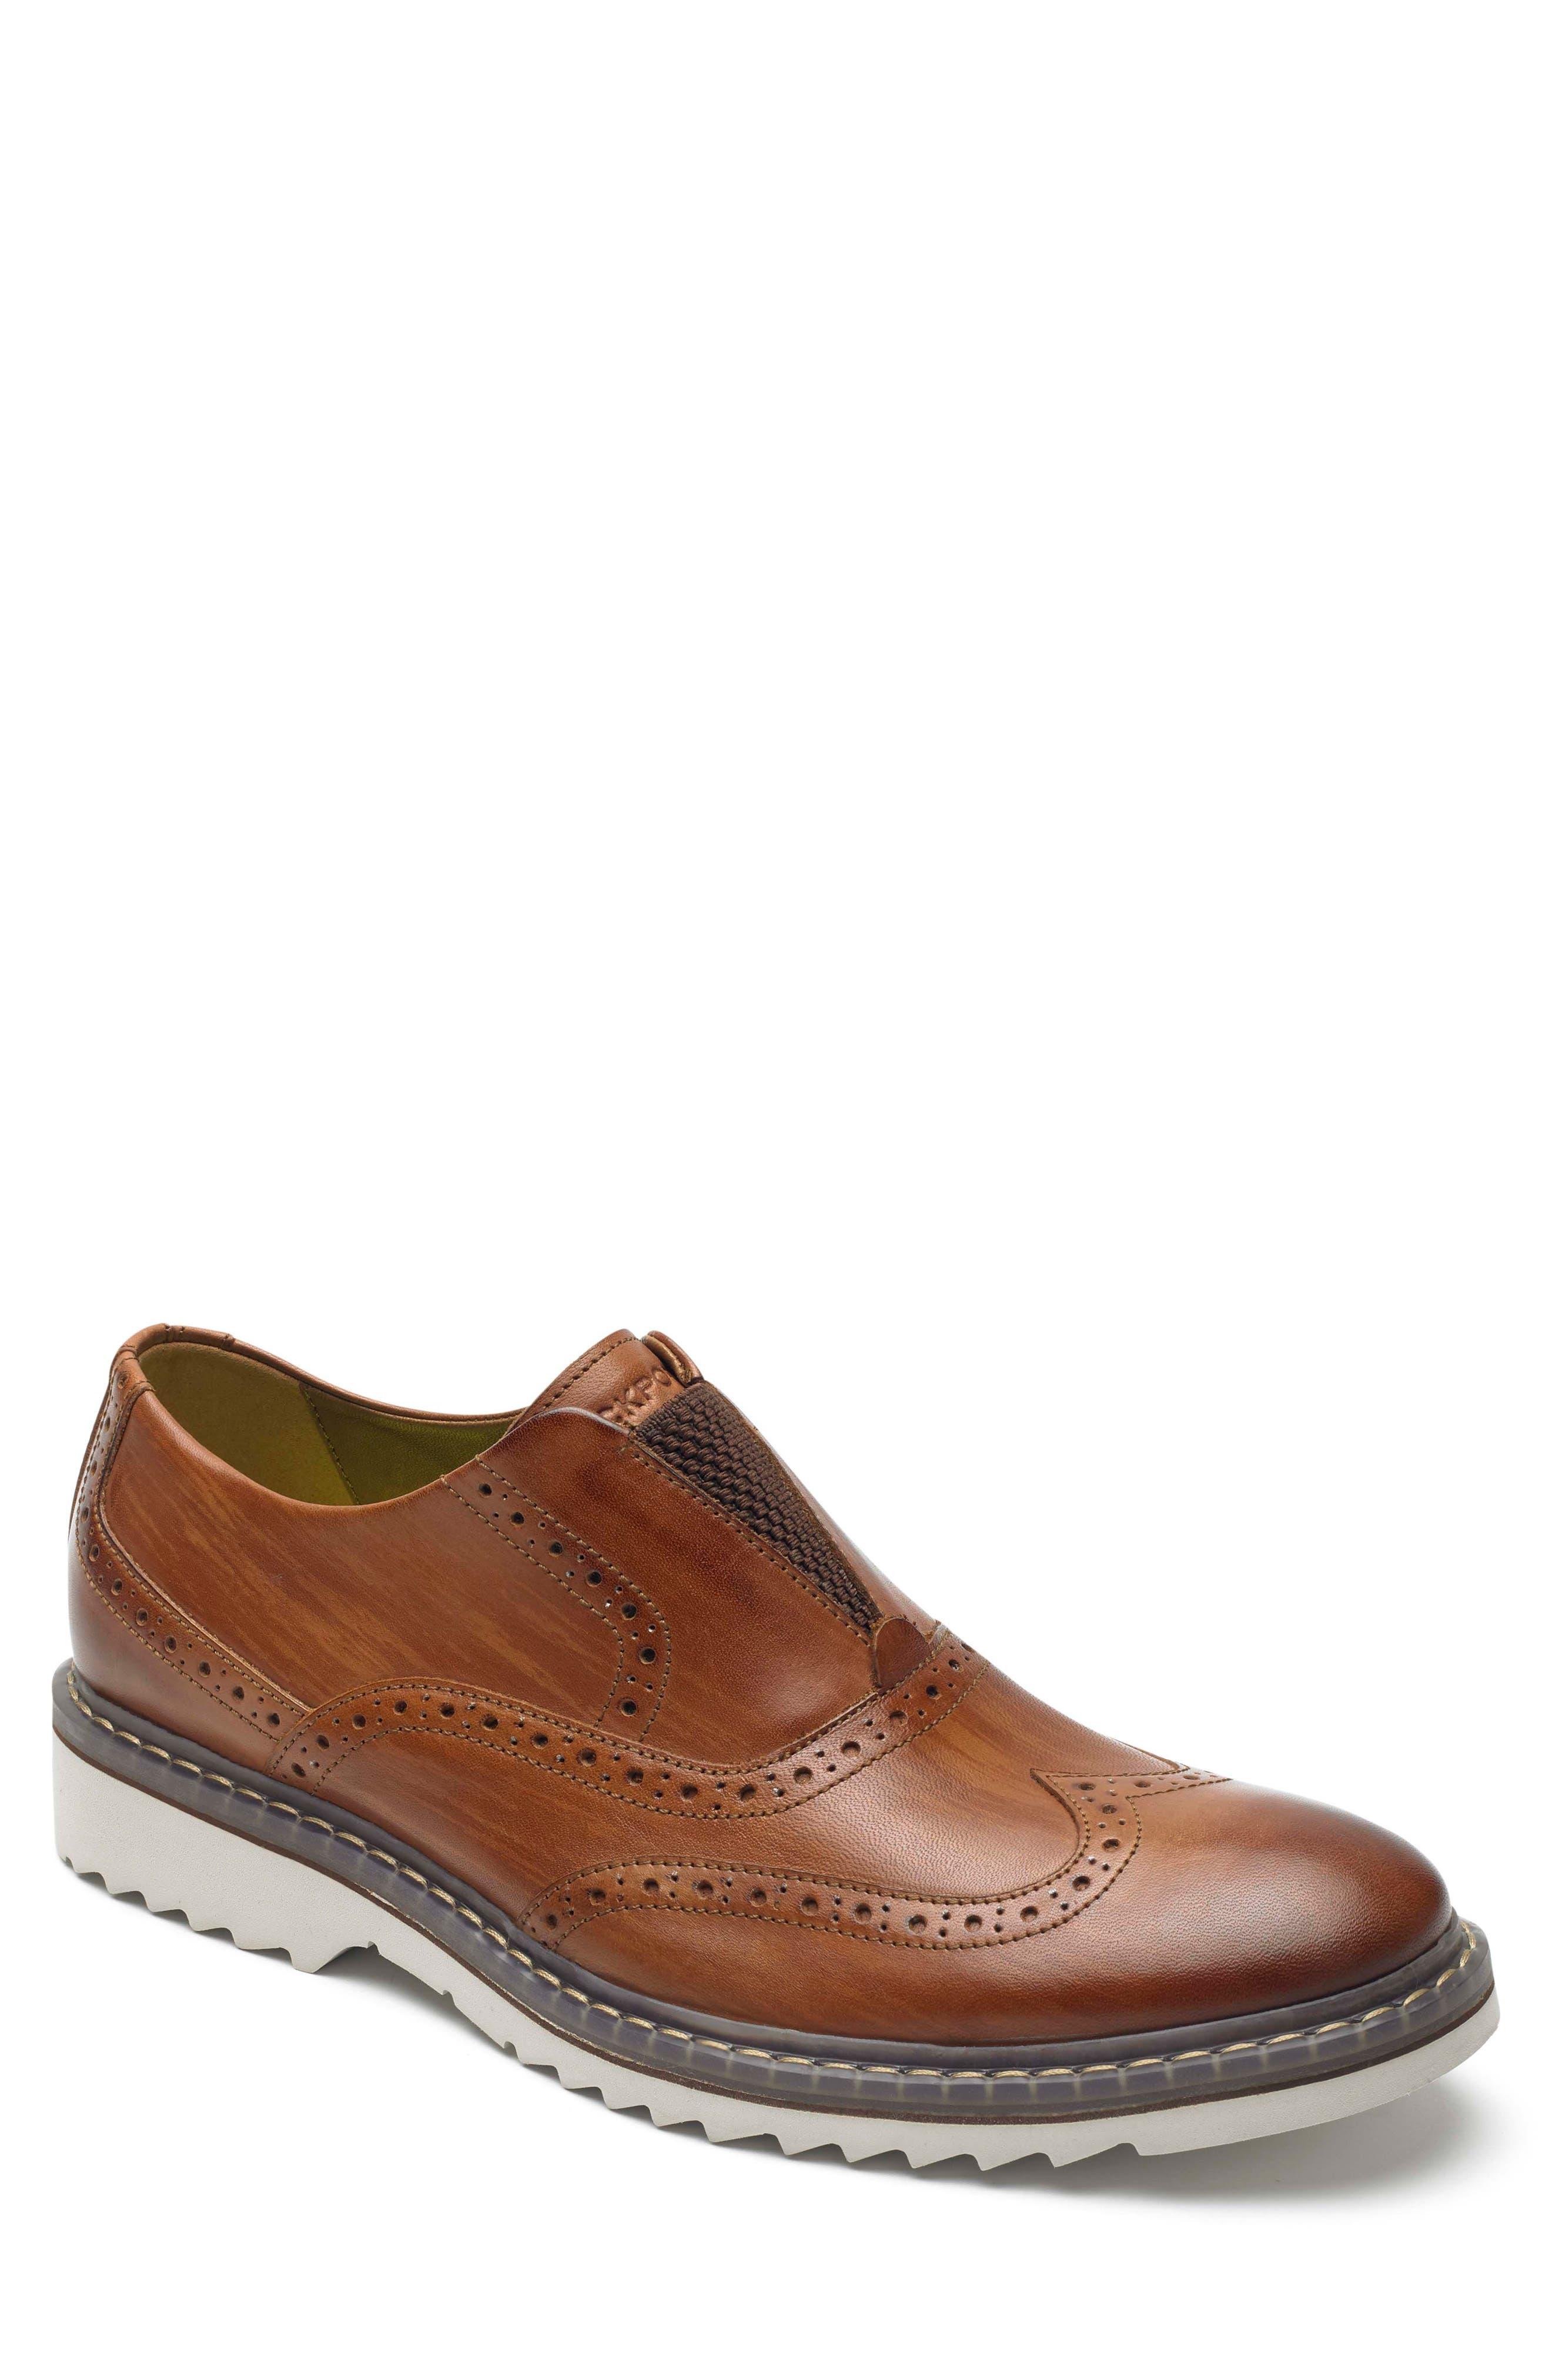 Jaxson Wingtip Slip-On,                         Main,                         color, Tan Leather